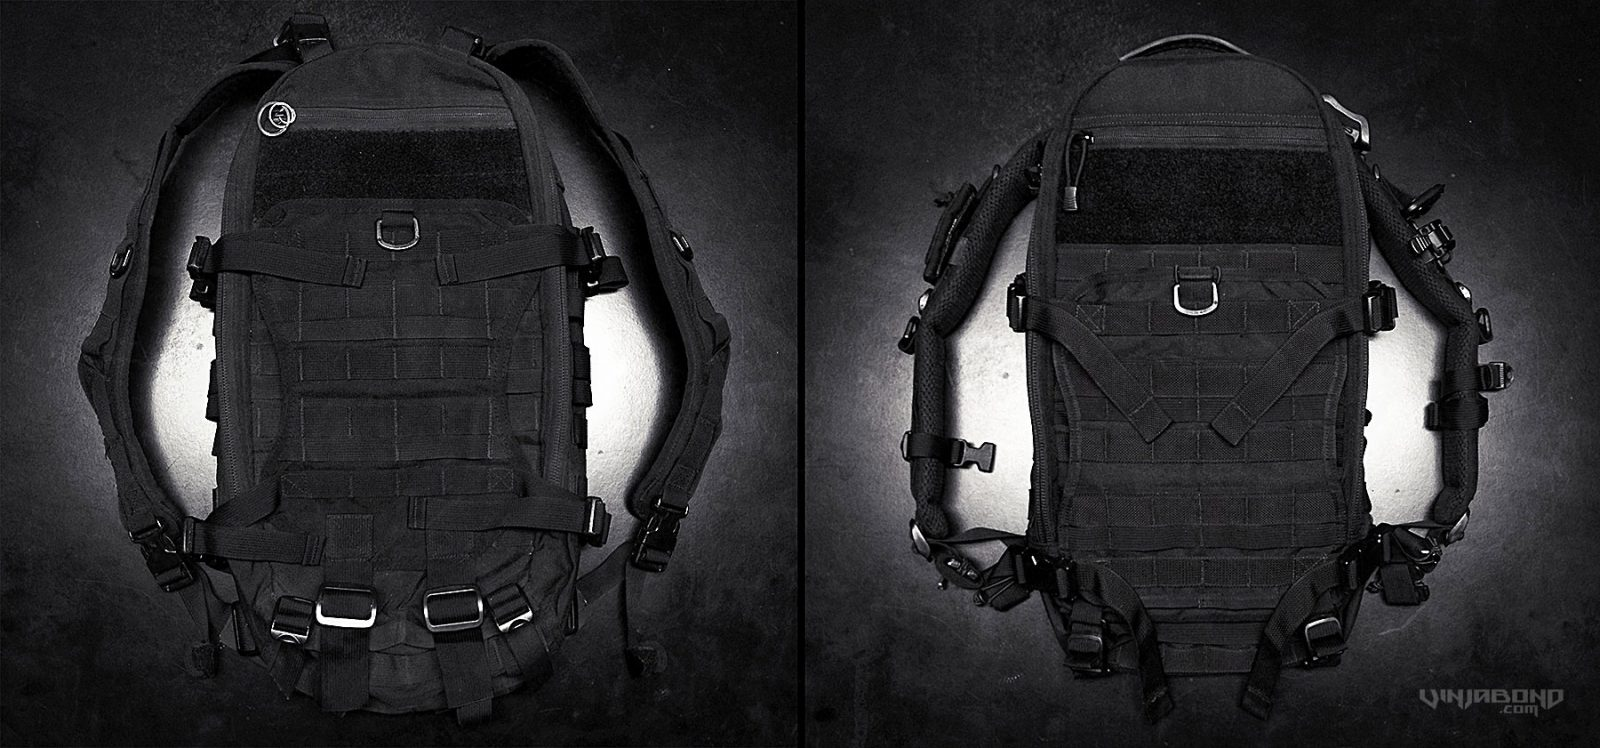 - Original FAST Pack Comparison w/ Reengineered Model -